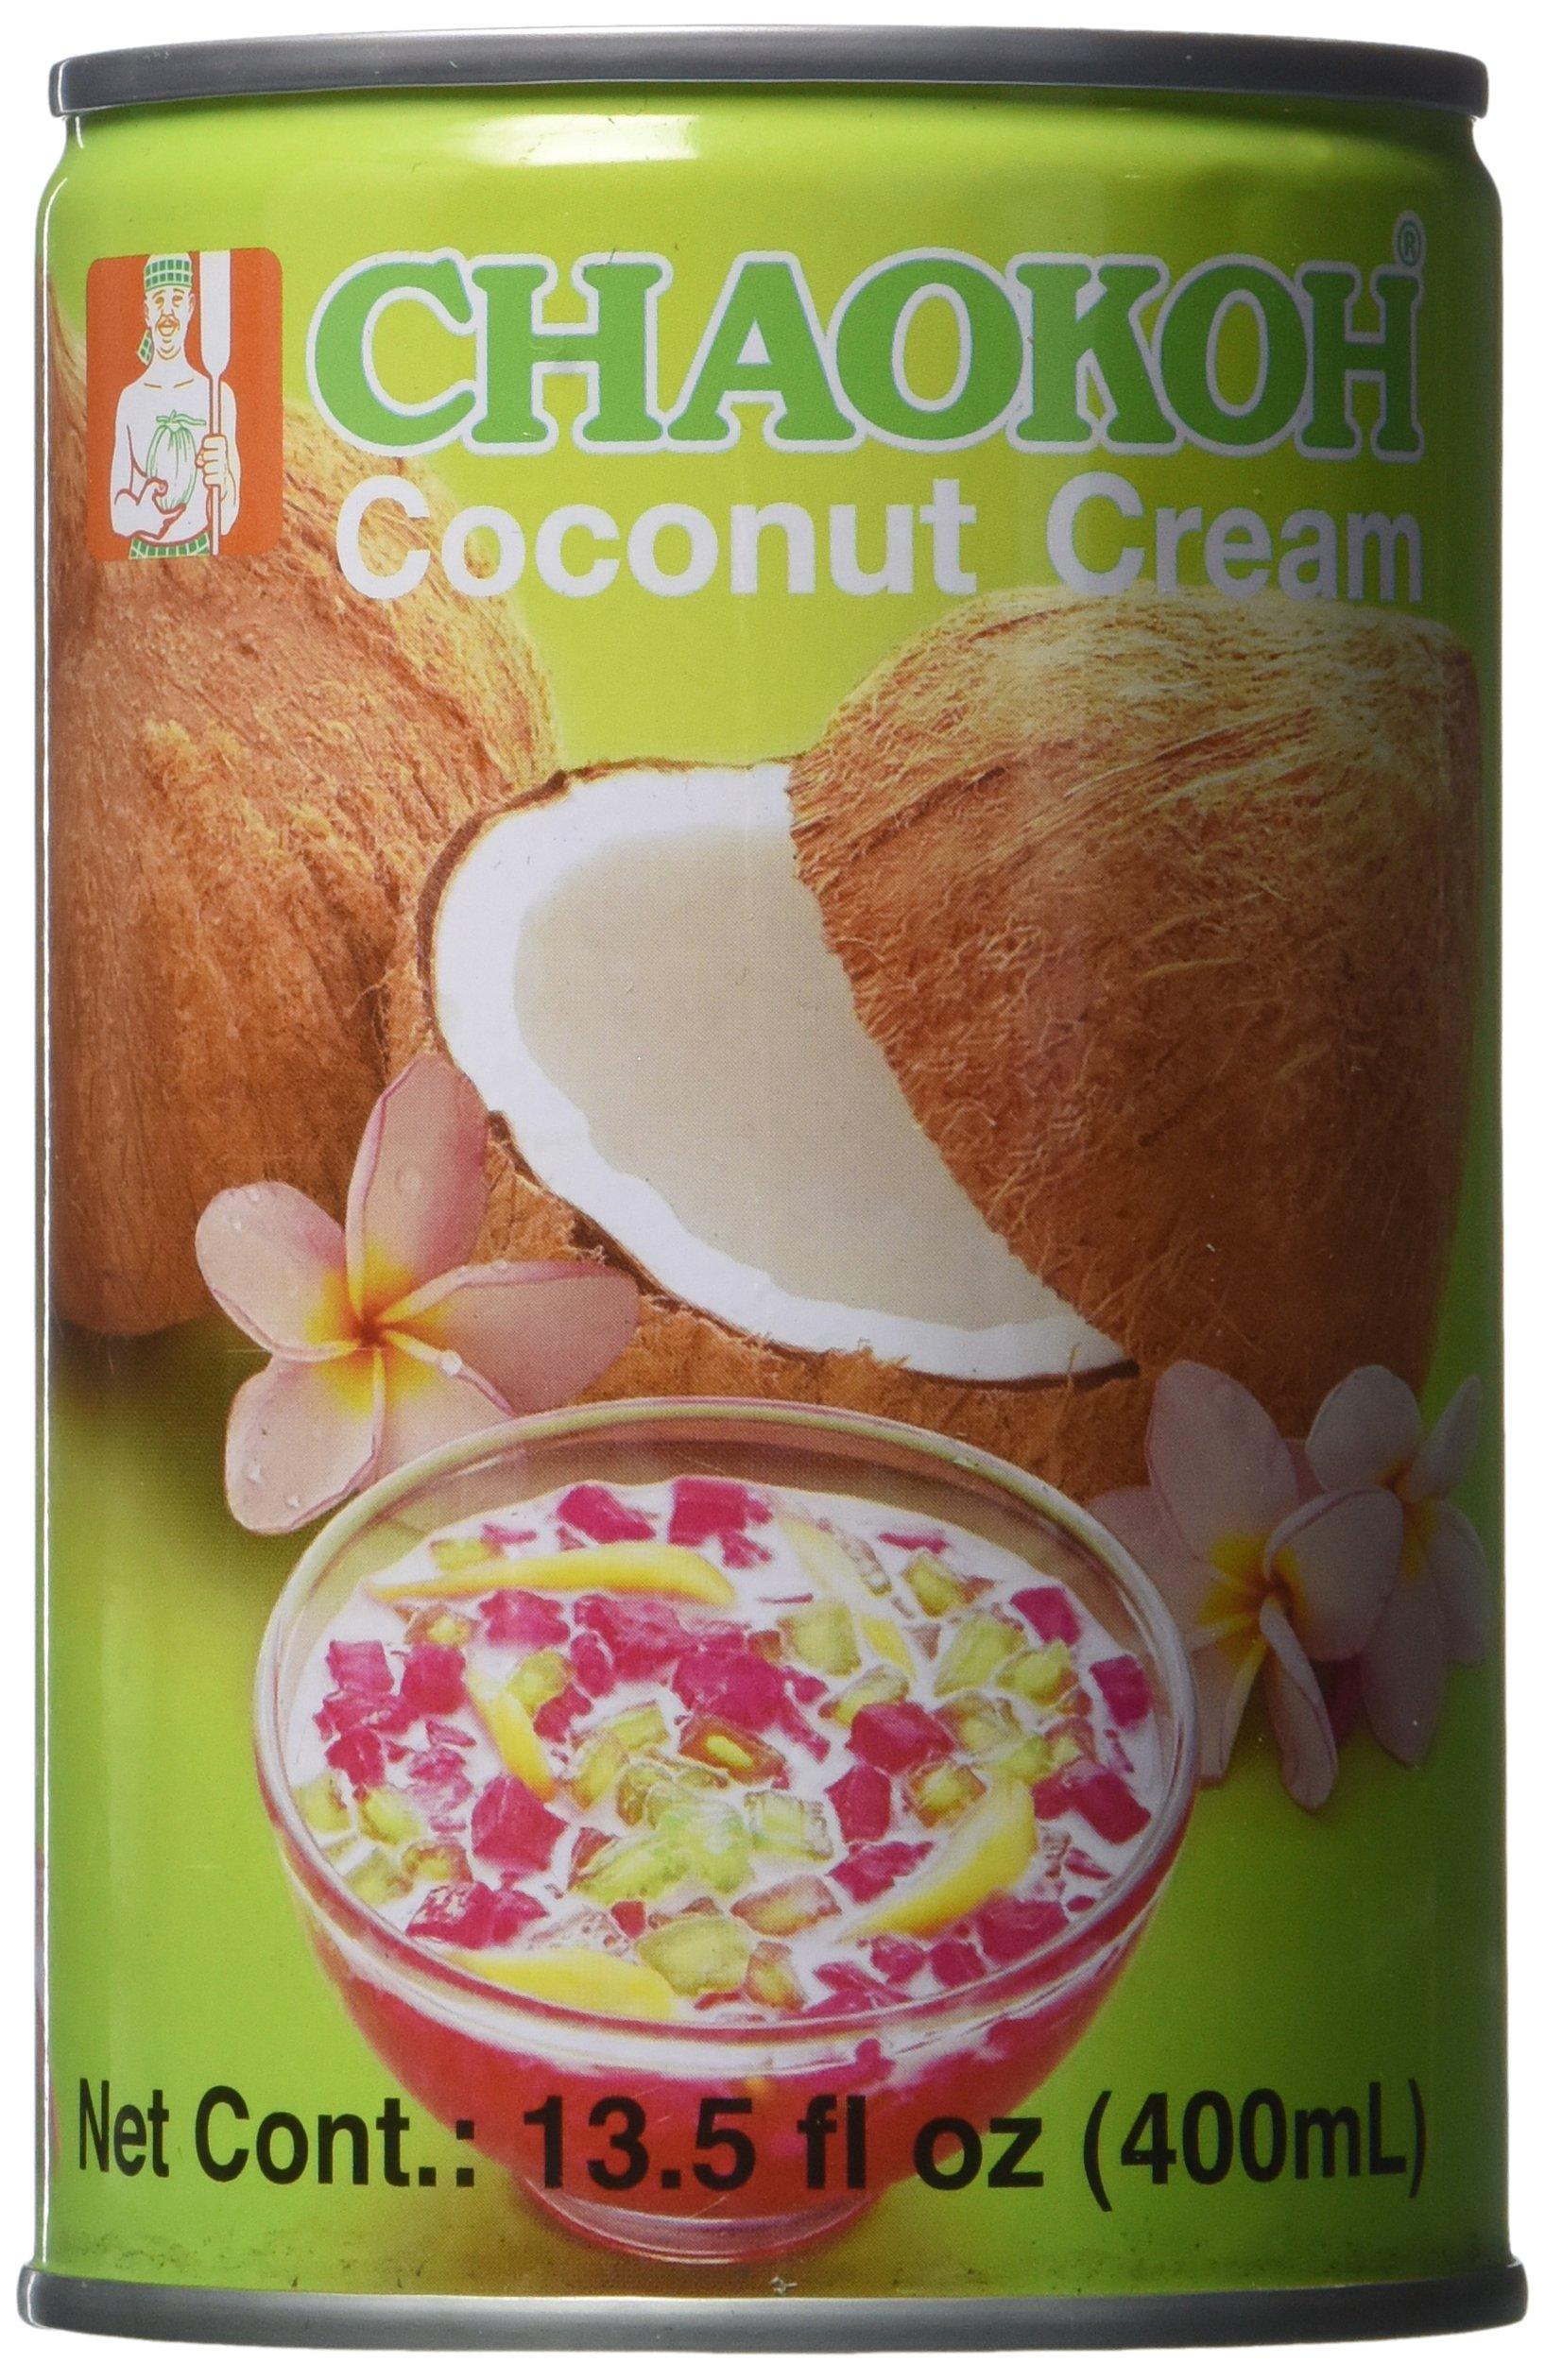 Chaokoh Coconut Cream, 13.5 Ounce by Chaokoh